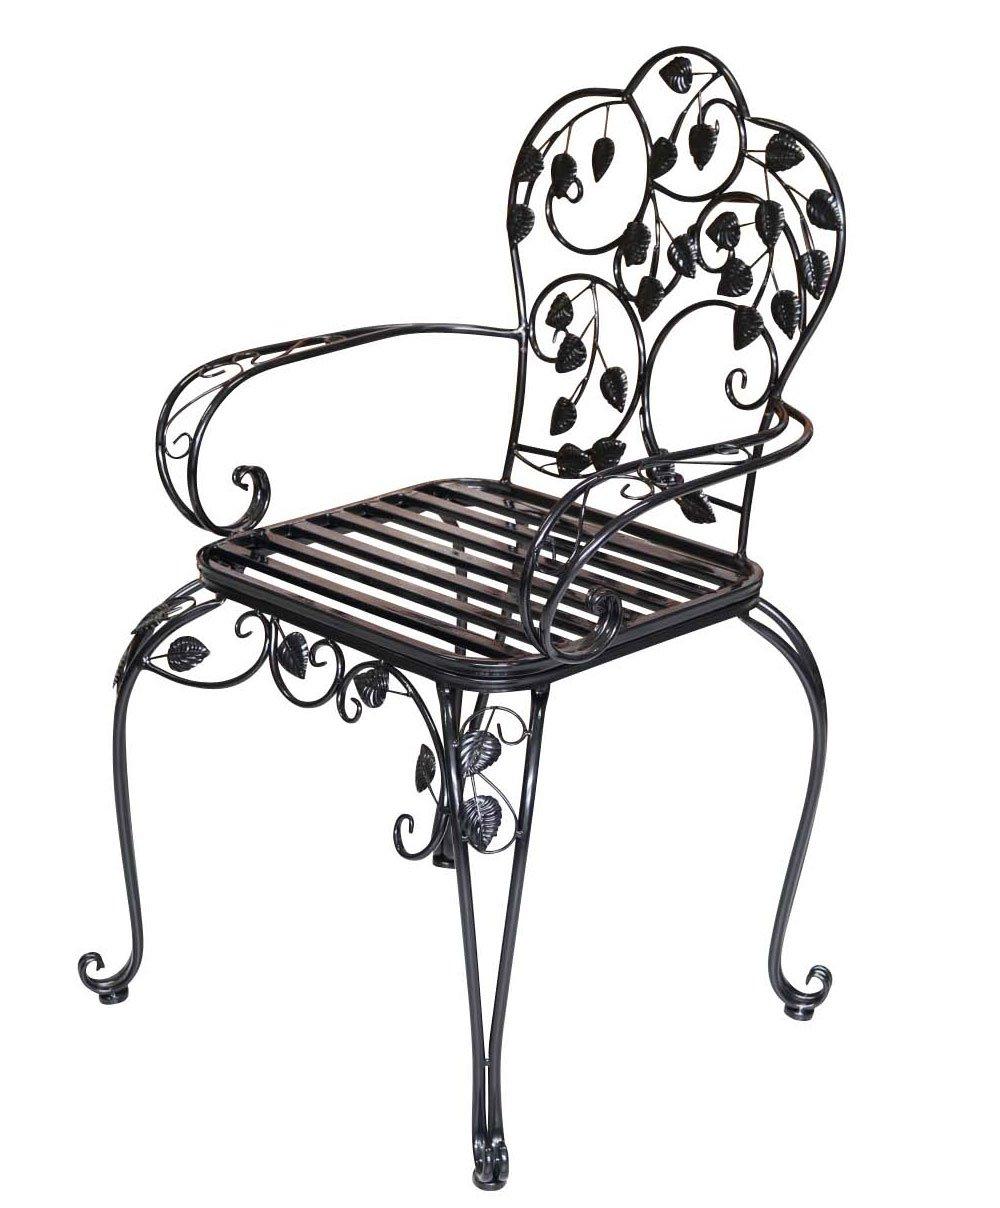 Bistro chair - metal - antique style - garden chair- 93cm - black aubaho